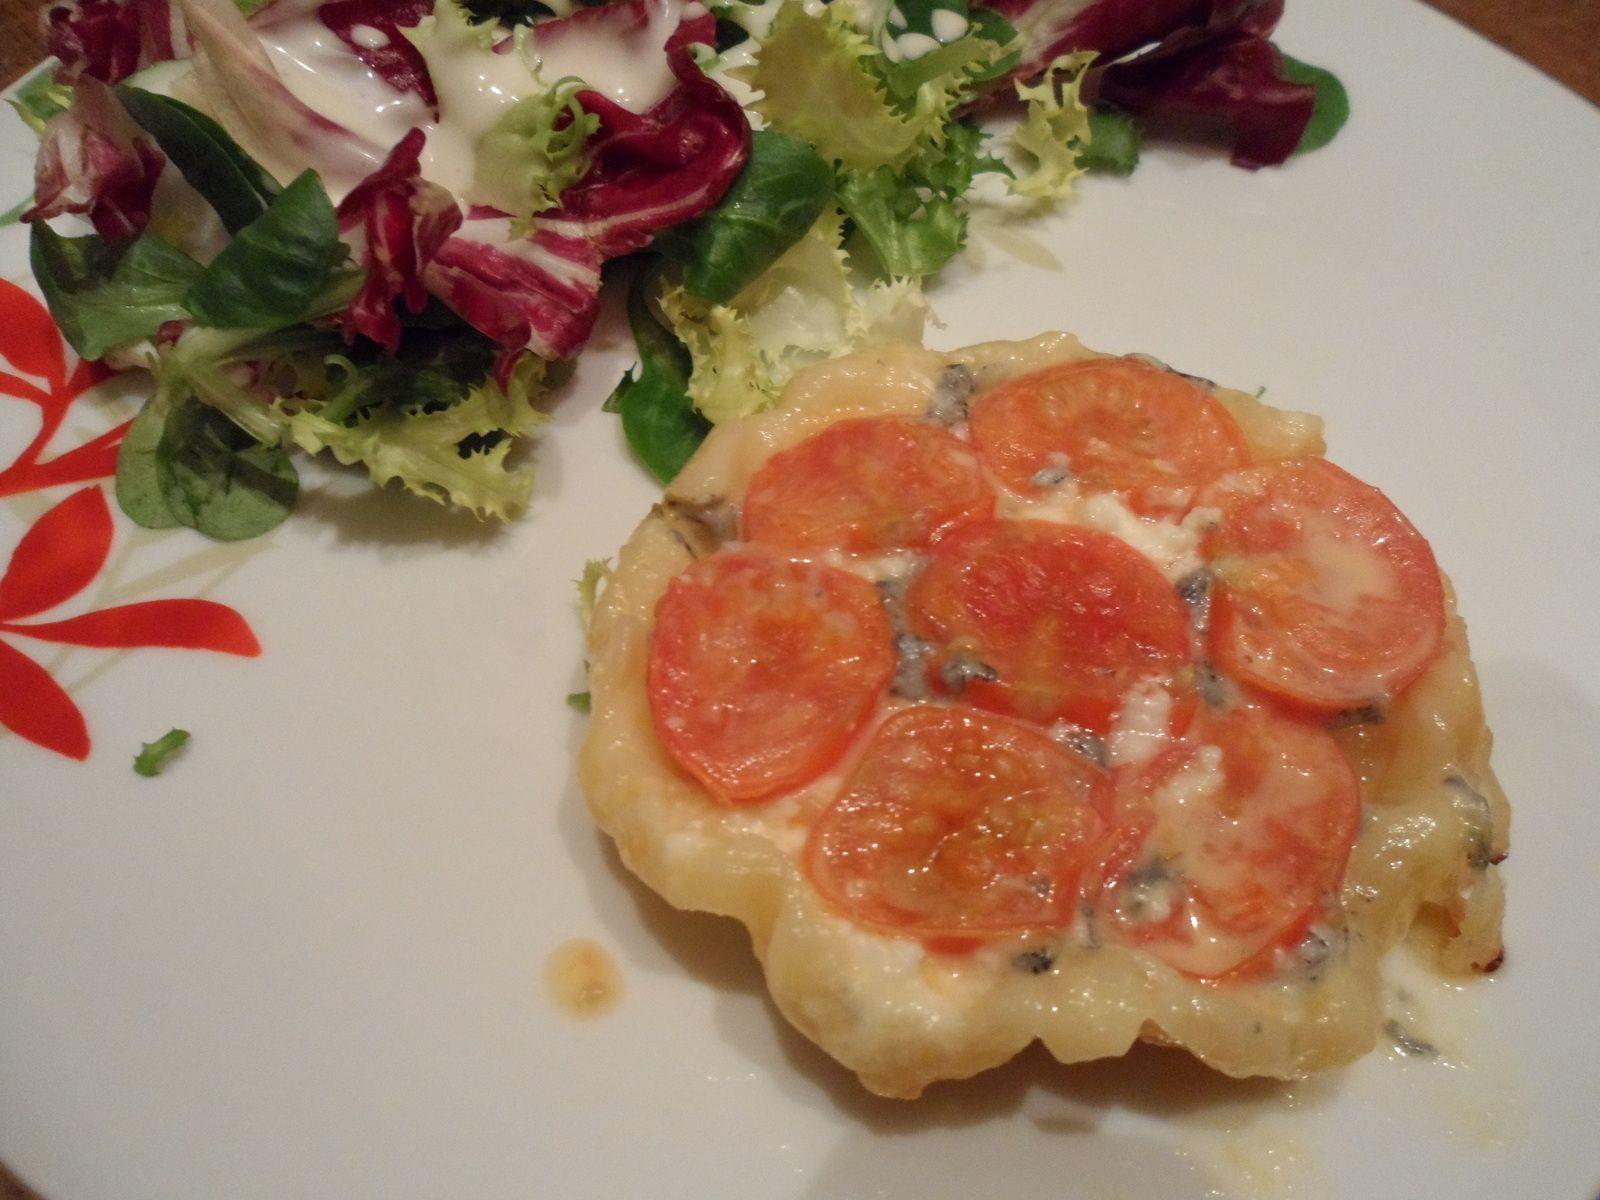 Tatin de tomate cerise et chèvre